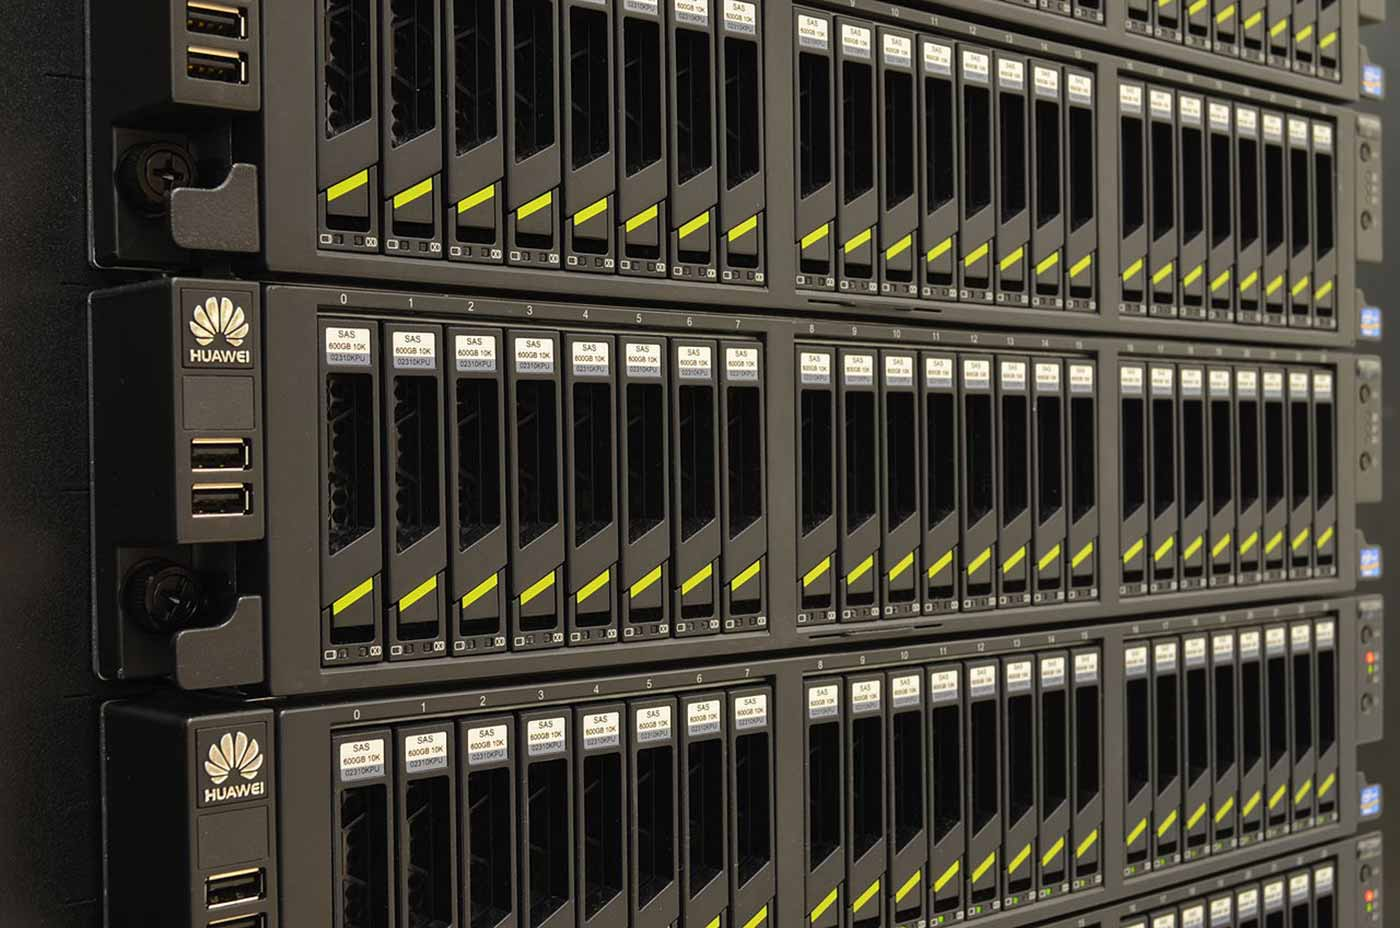 Huawei rack server